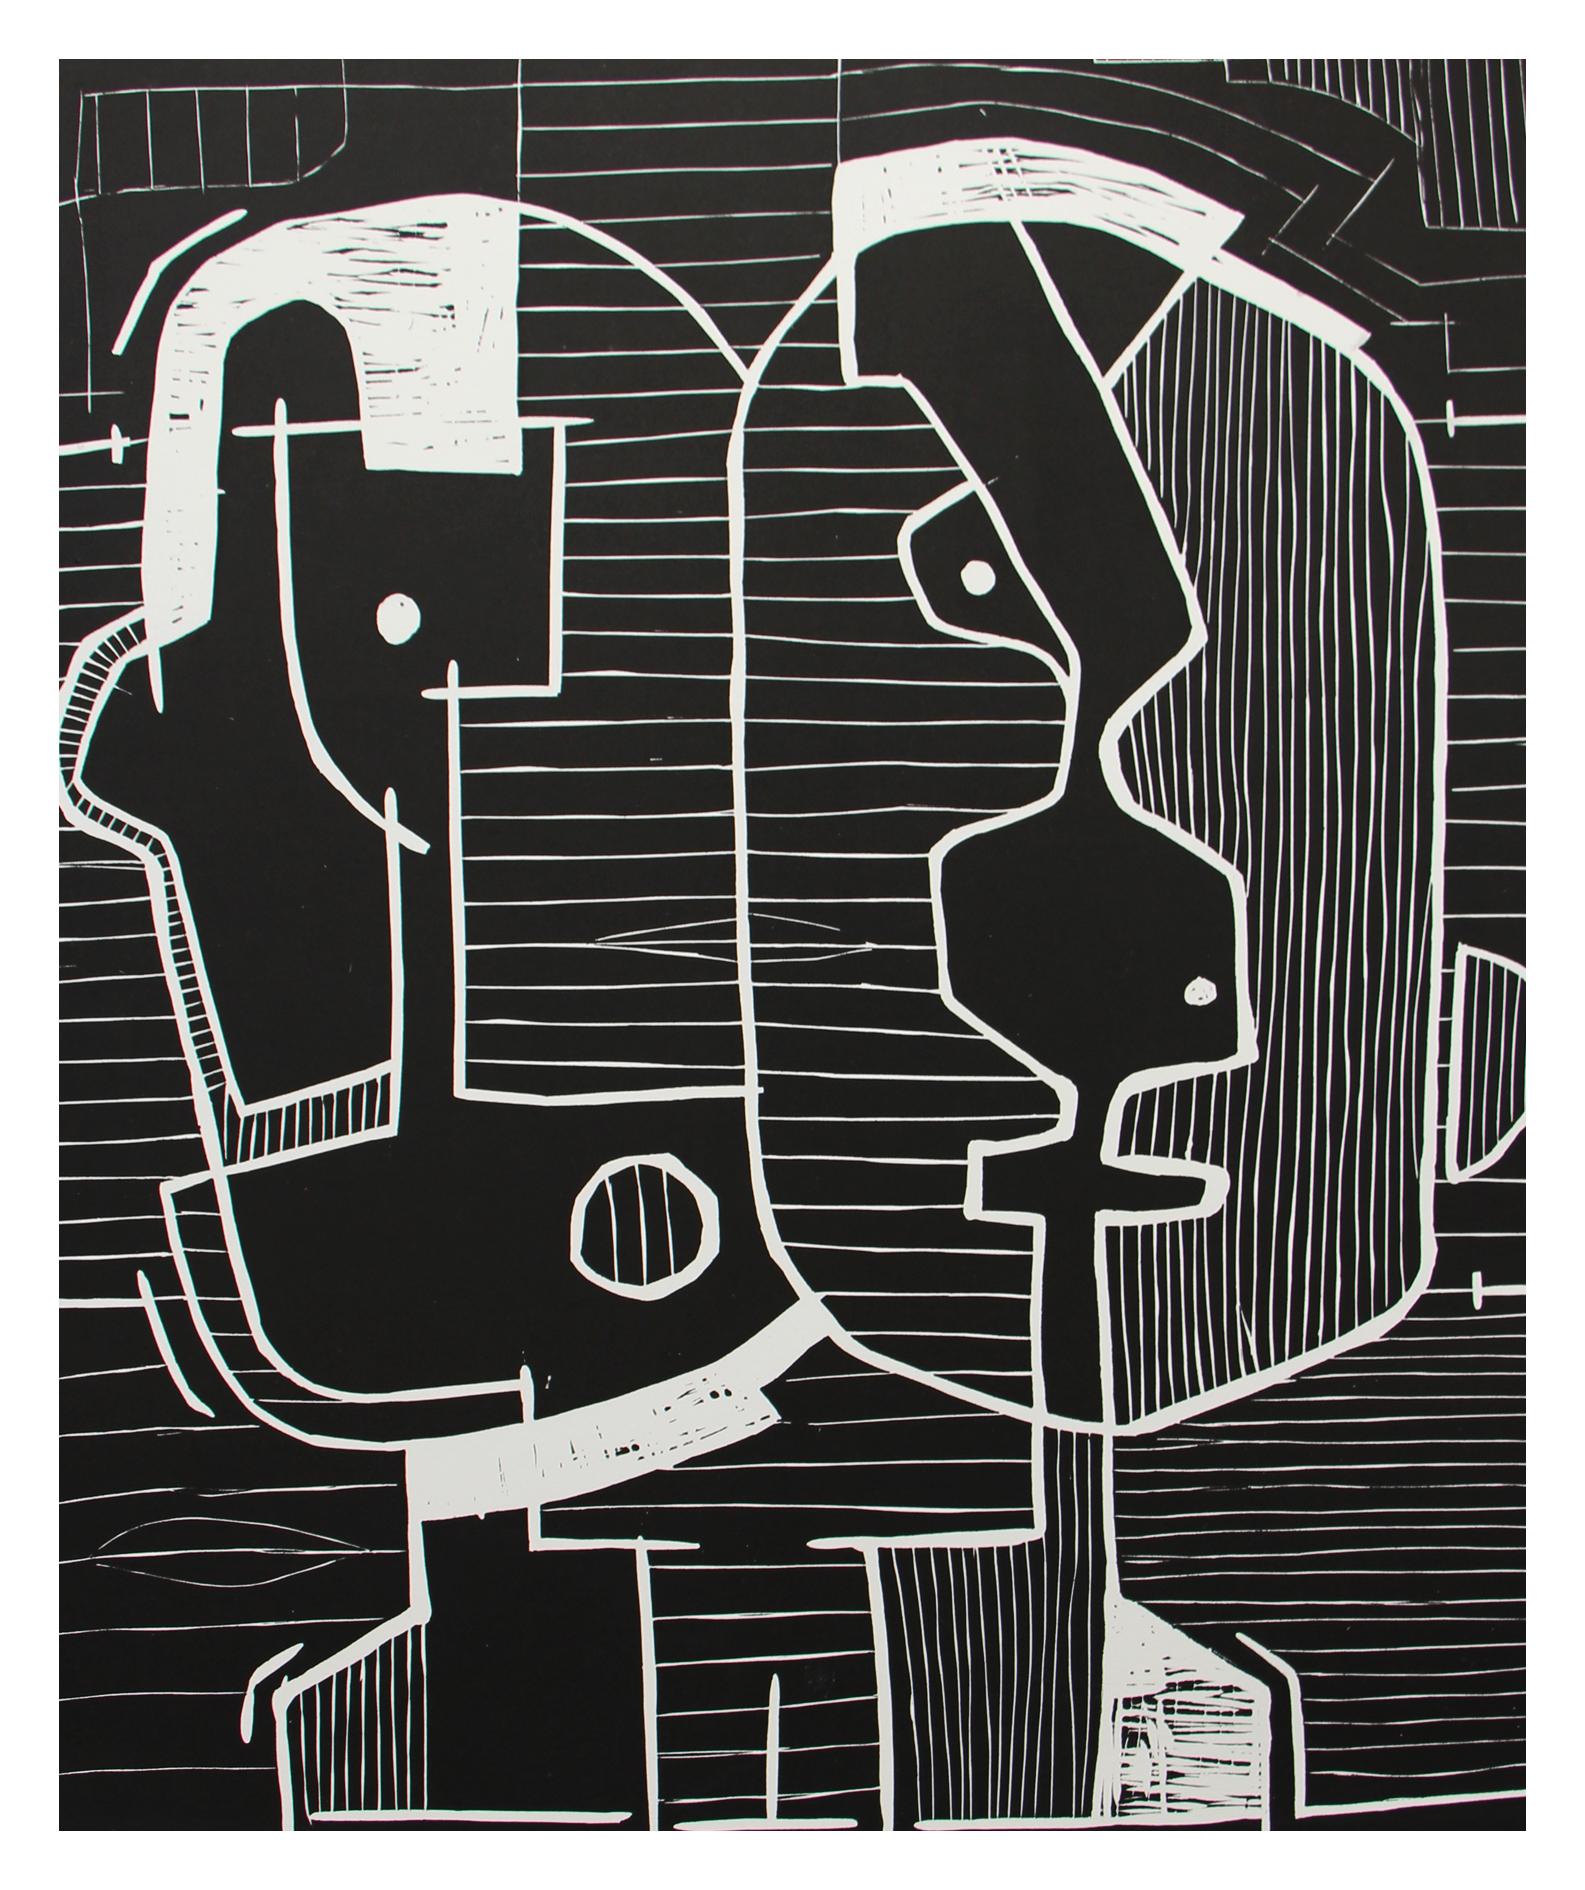 Renée Rossouw  Faces  I/VI Linocut on Zerkel Litho 53.5 x 41.5 cm R3 600